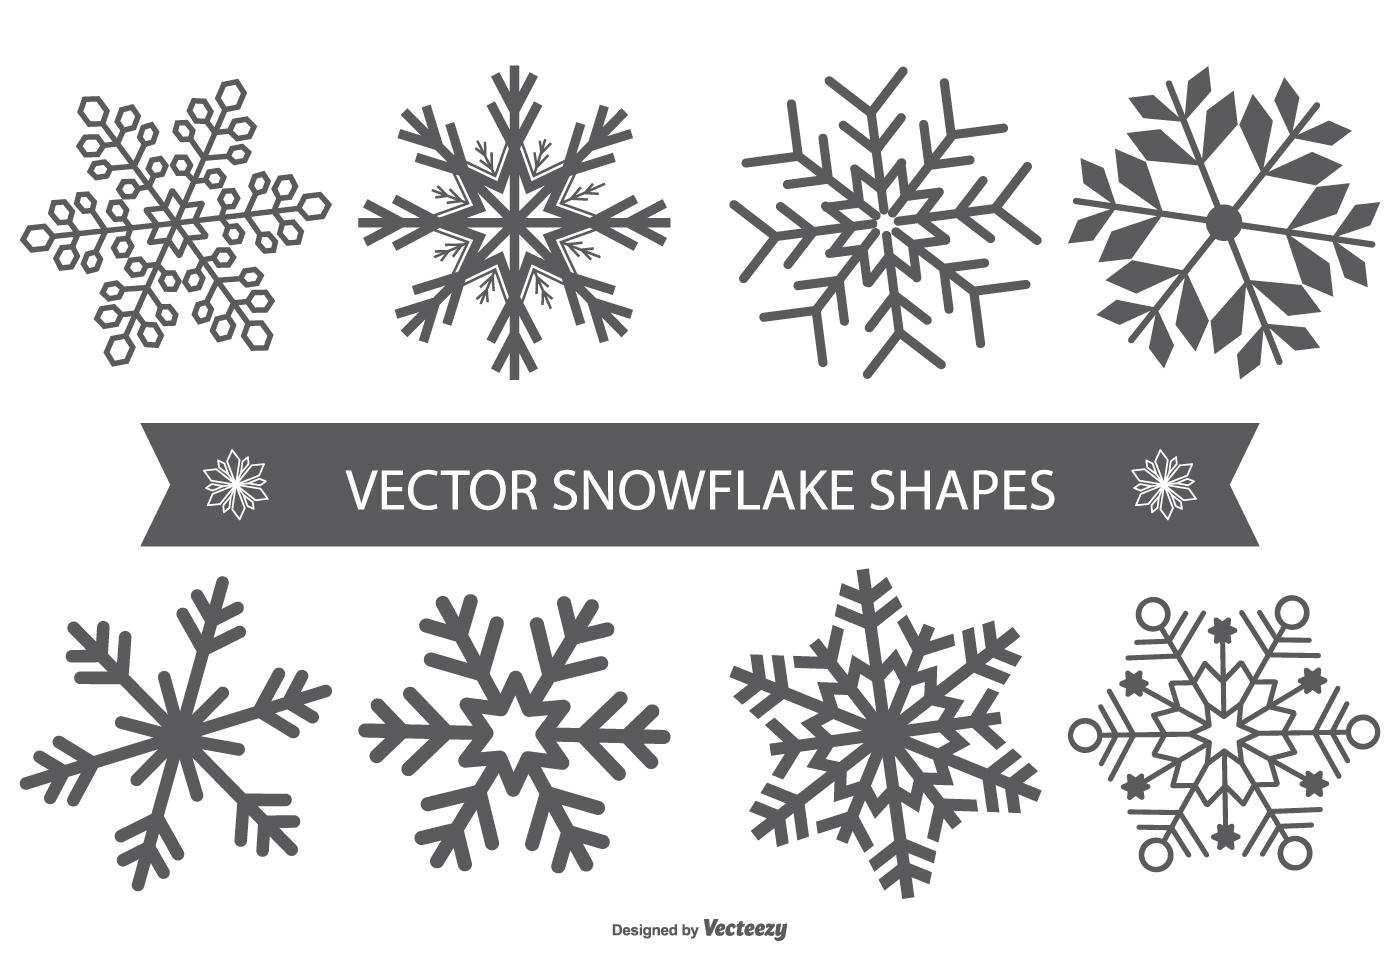 Snowflake Vector Shapes